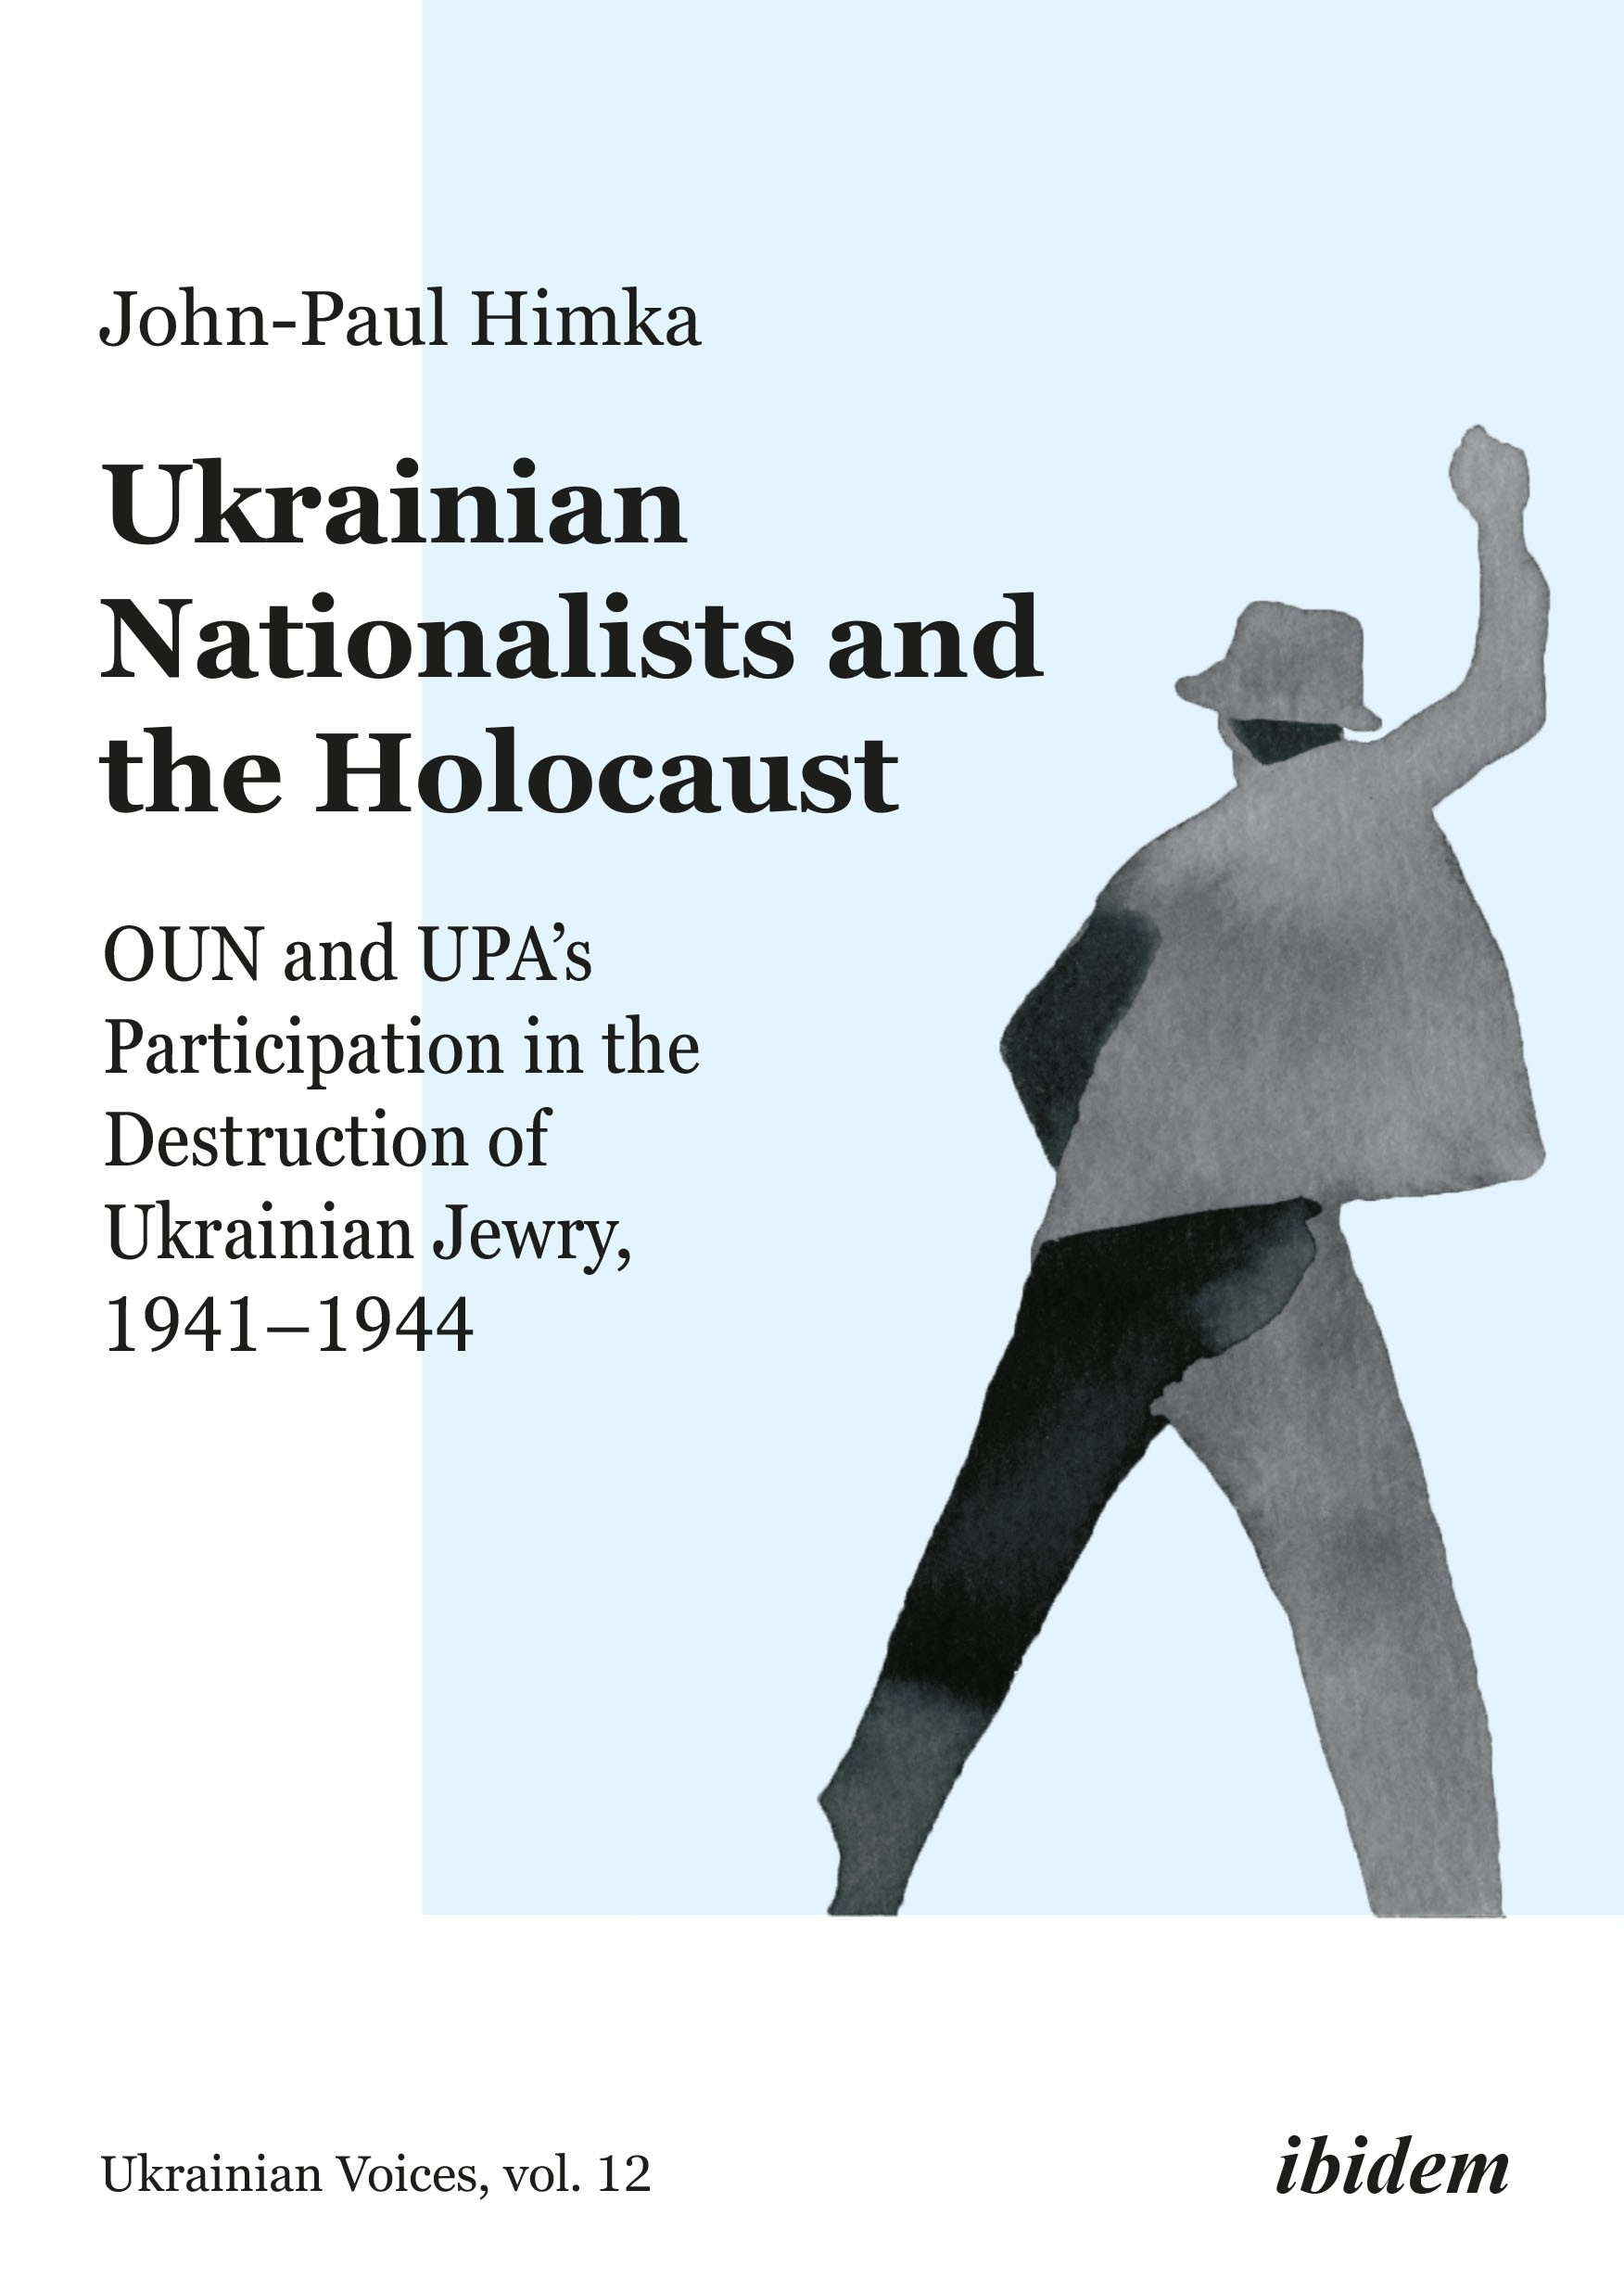 Ukrainian Nationalists and the Holocaust